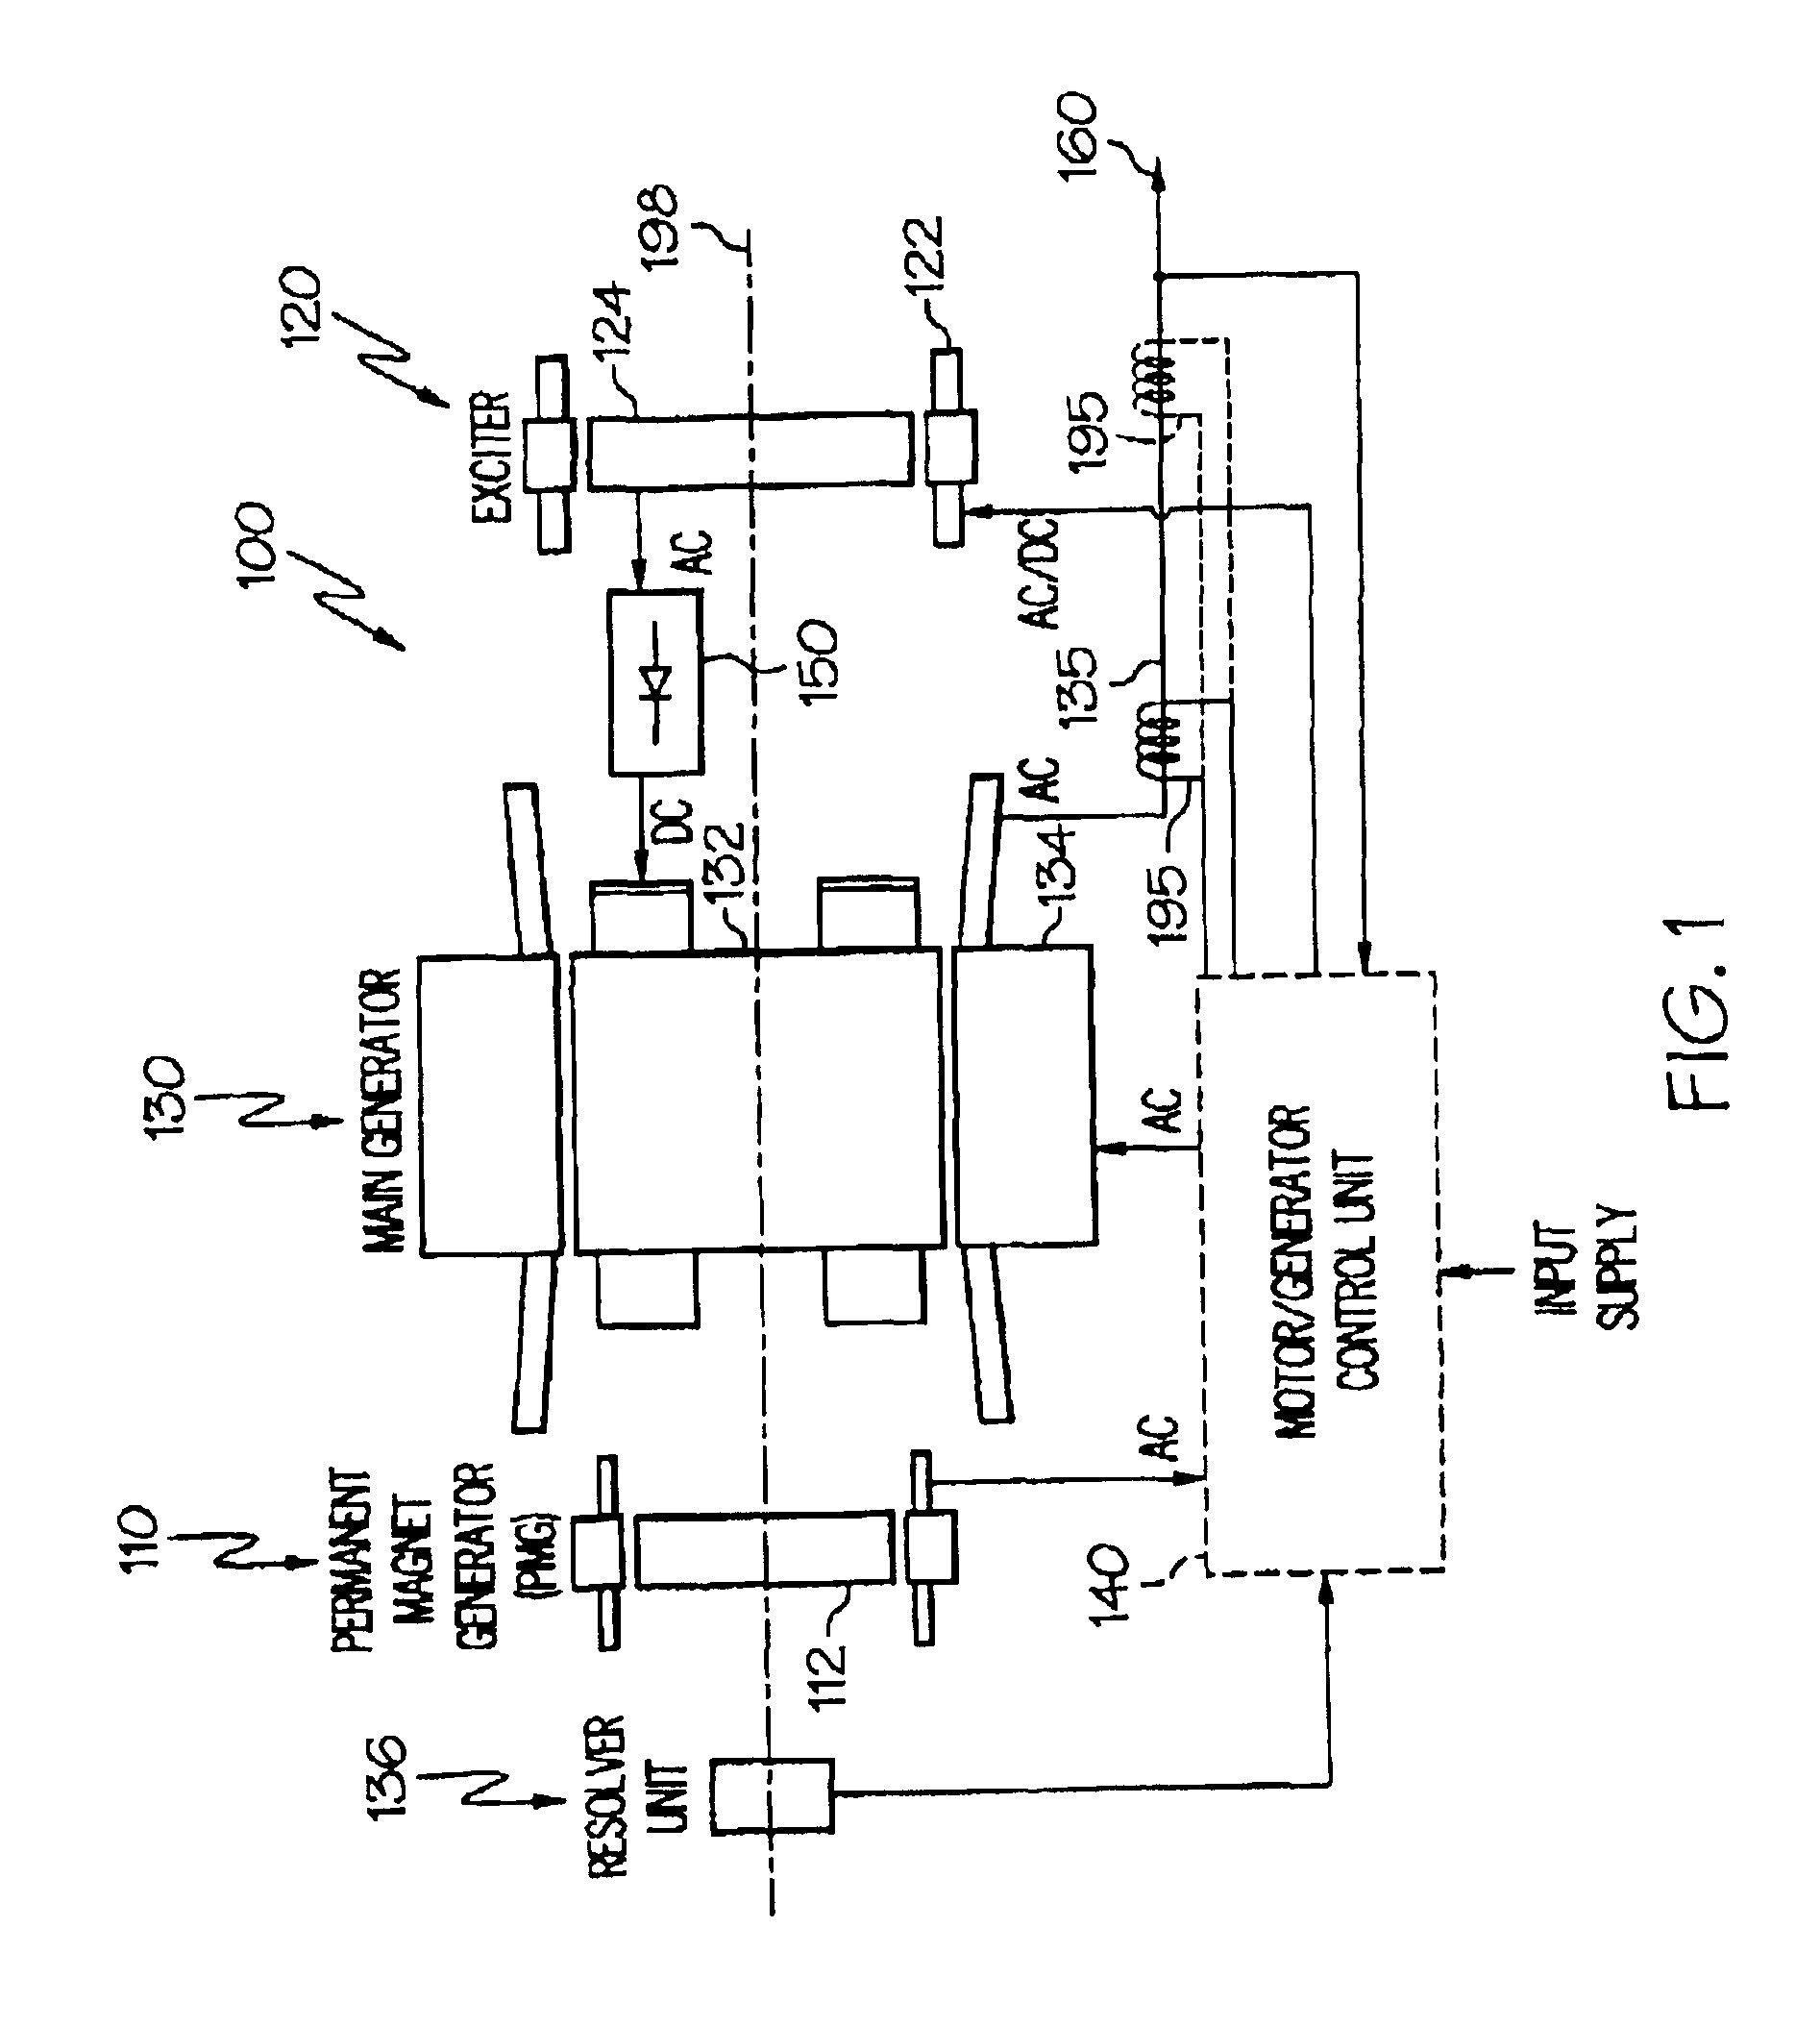 small resolution of unique wiring diagram starter generator diagram diagramtemplate diagramsample